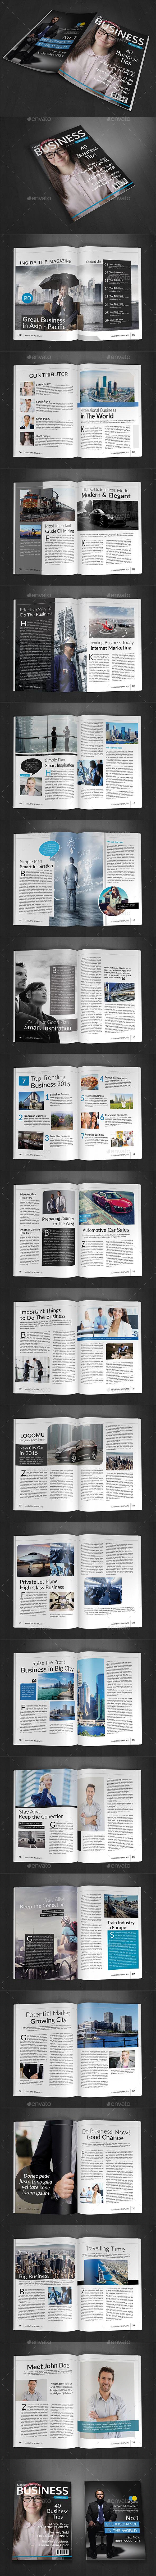 A4 Magazine Template Vol.9 - Magazines Print Templates